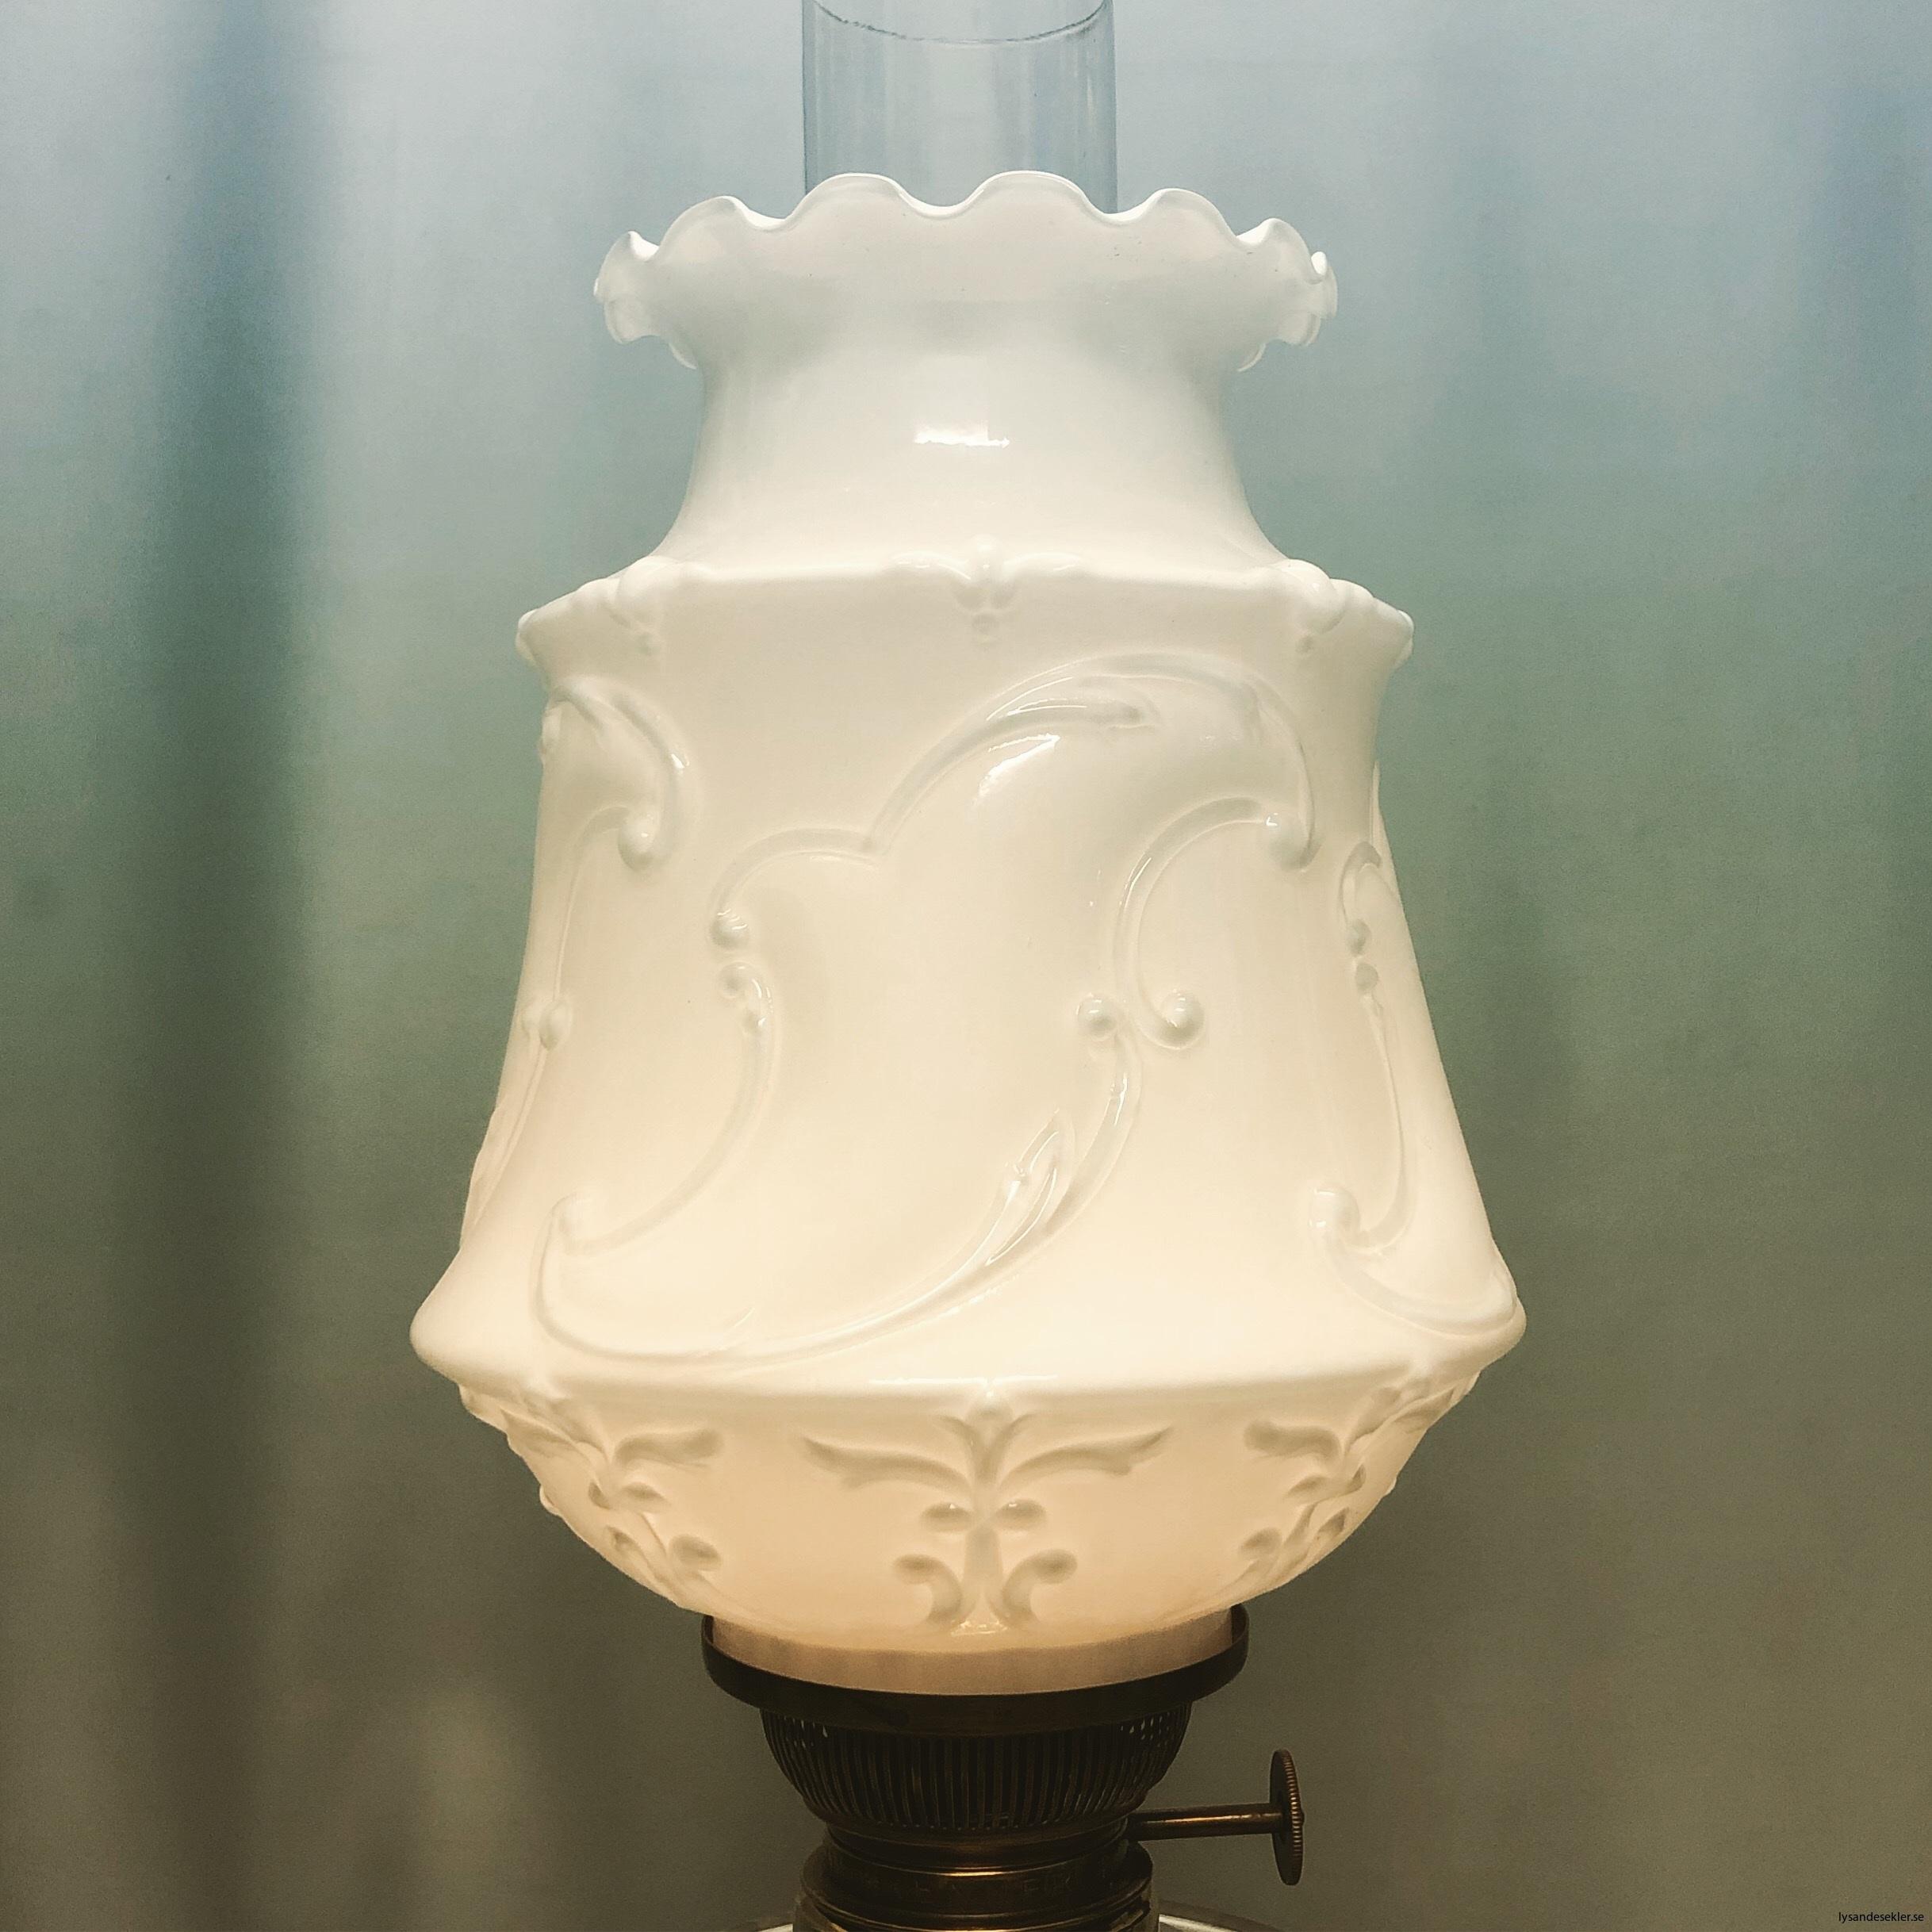 fotogenlampskupa kupa till fotogenlampa tulipan tulpan tulpankupor kupor1